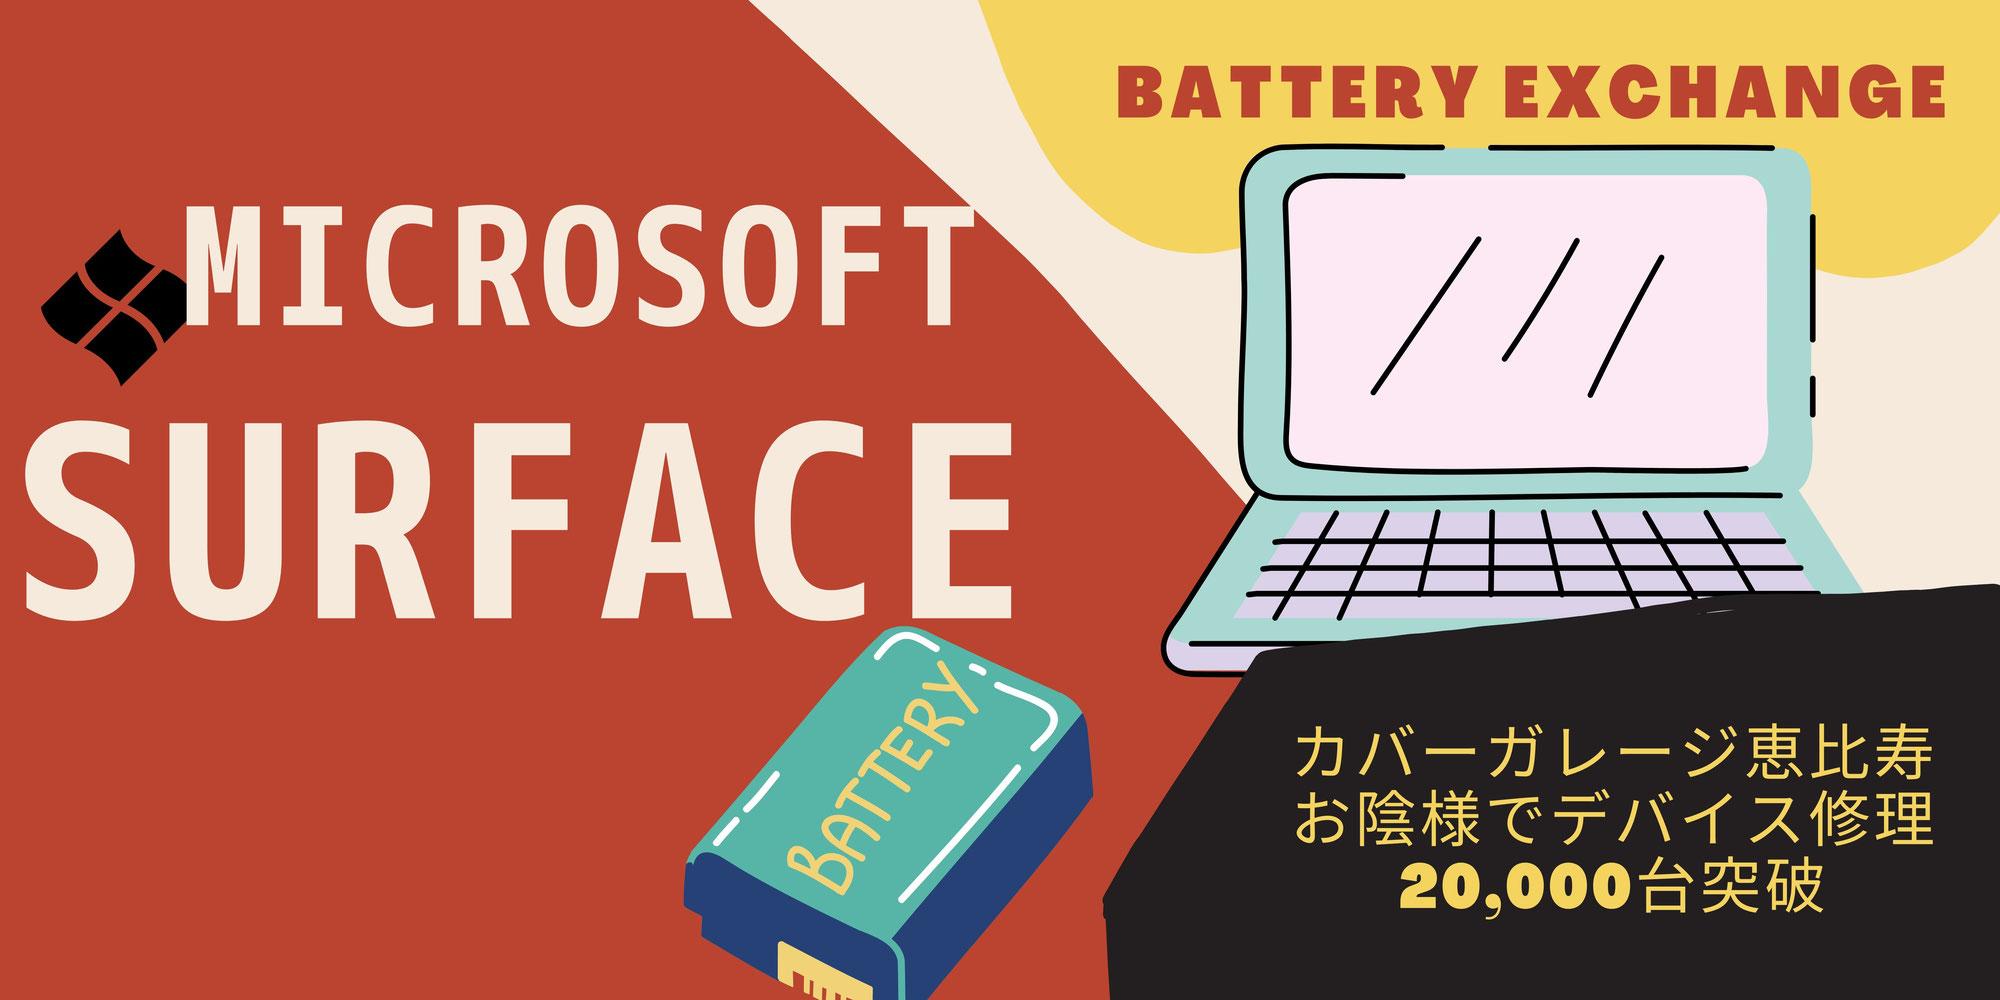 Surfaceバッテリー交換料金